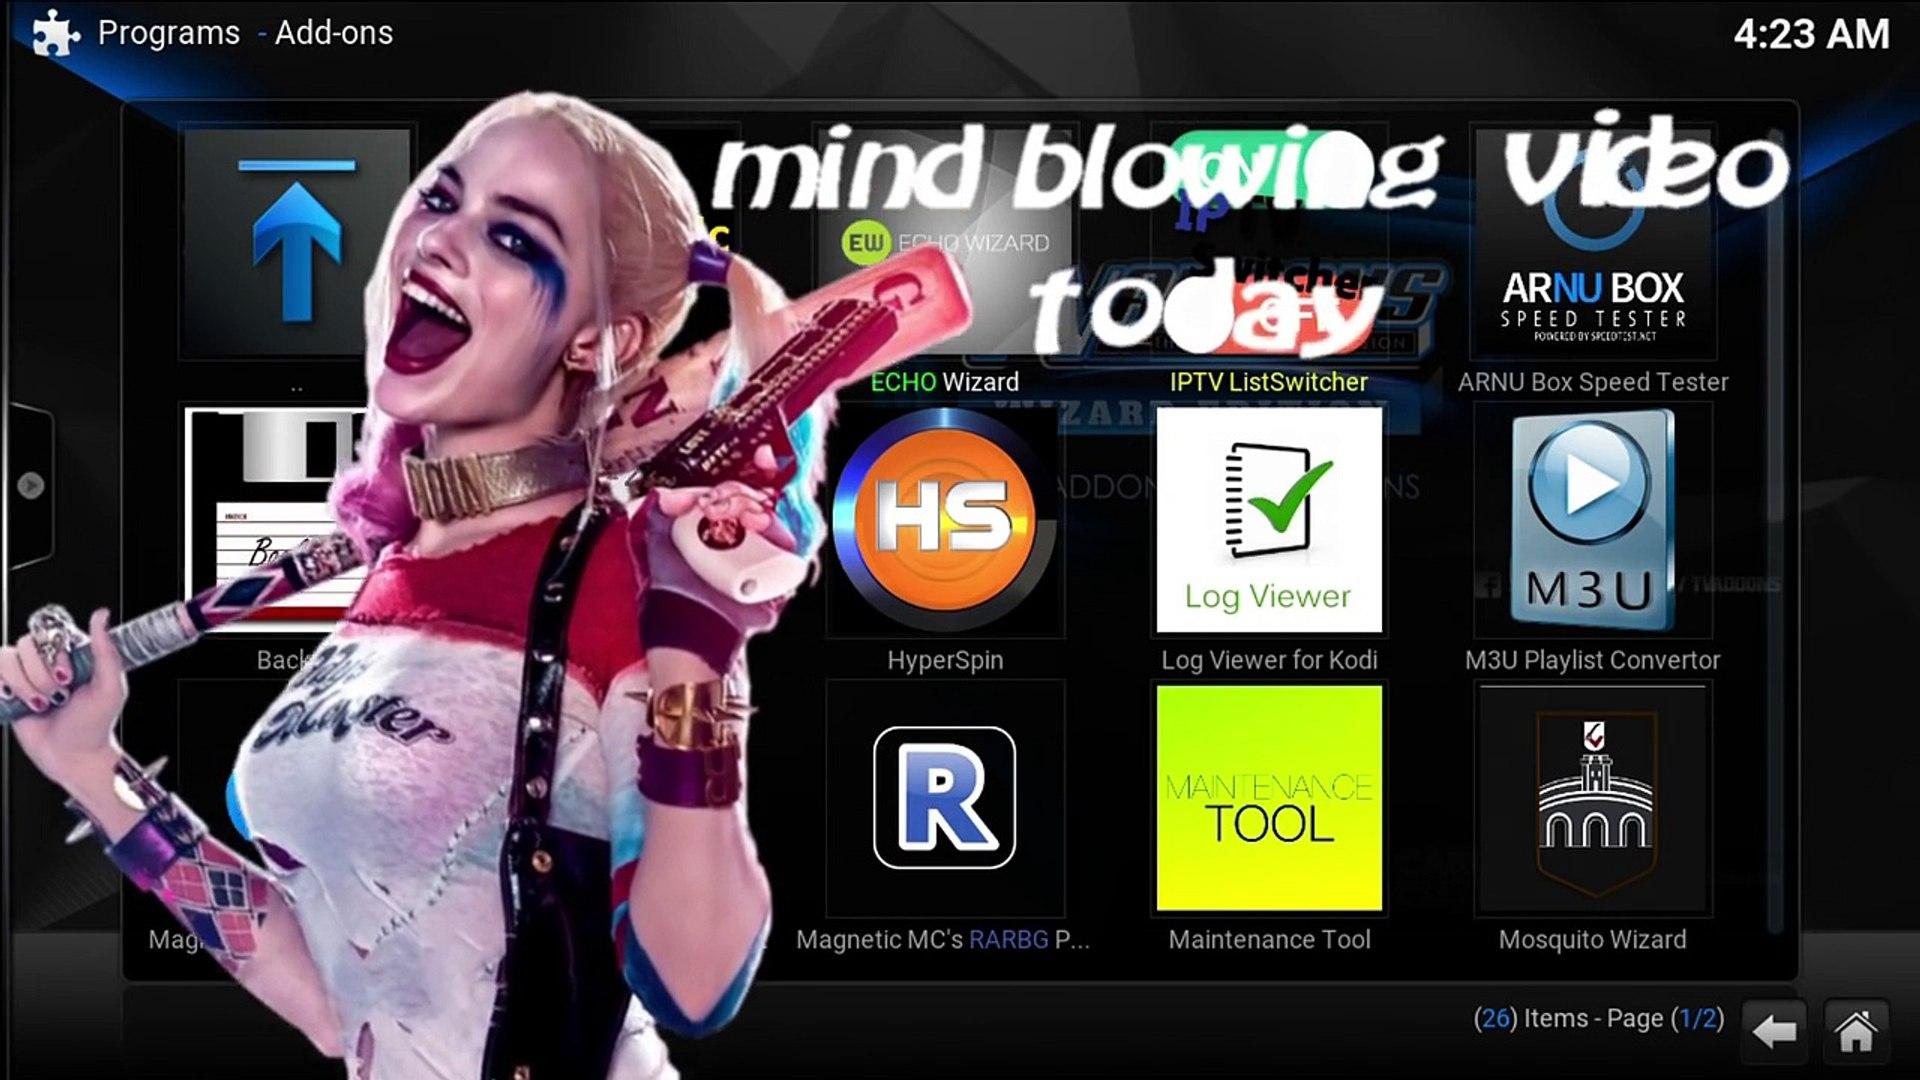 KODI LIVE STREAM PRO F4M TESTER PROXY FIX IT INSTALL IT EASY STEPS WATCH  IPTV LIVE TV XBMC KODI 2016